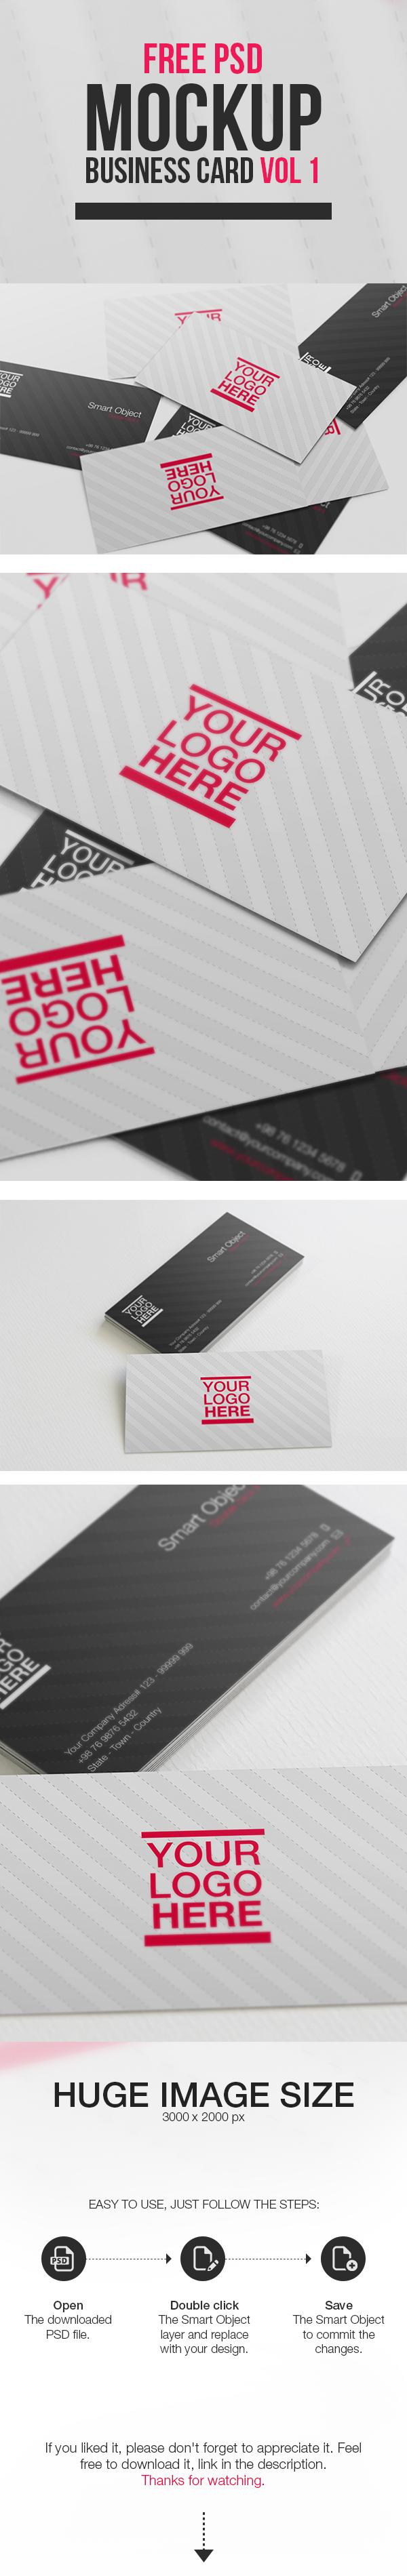 Free PSD Mockup - Business Card Vol 1 on Behance | Free stuff ...